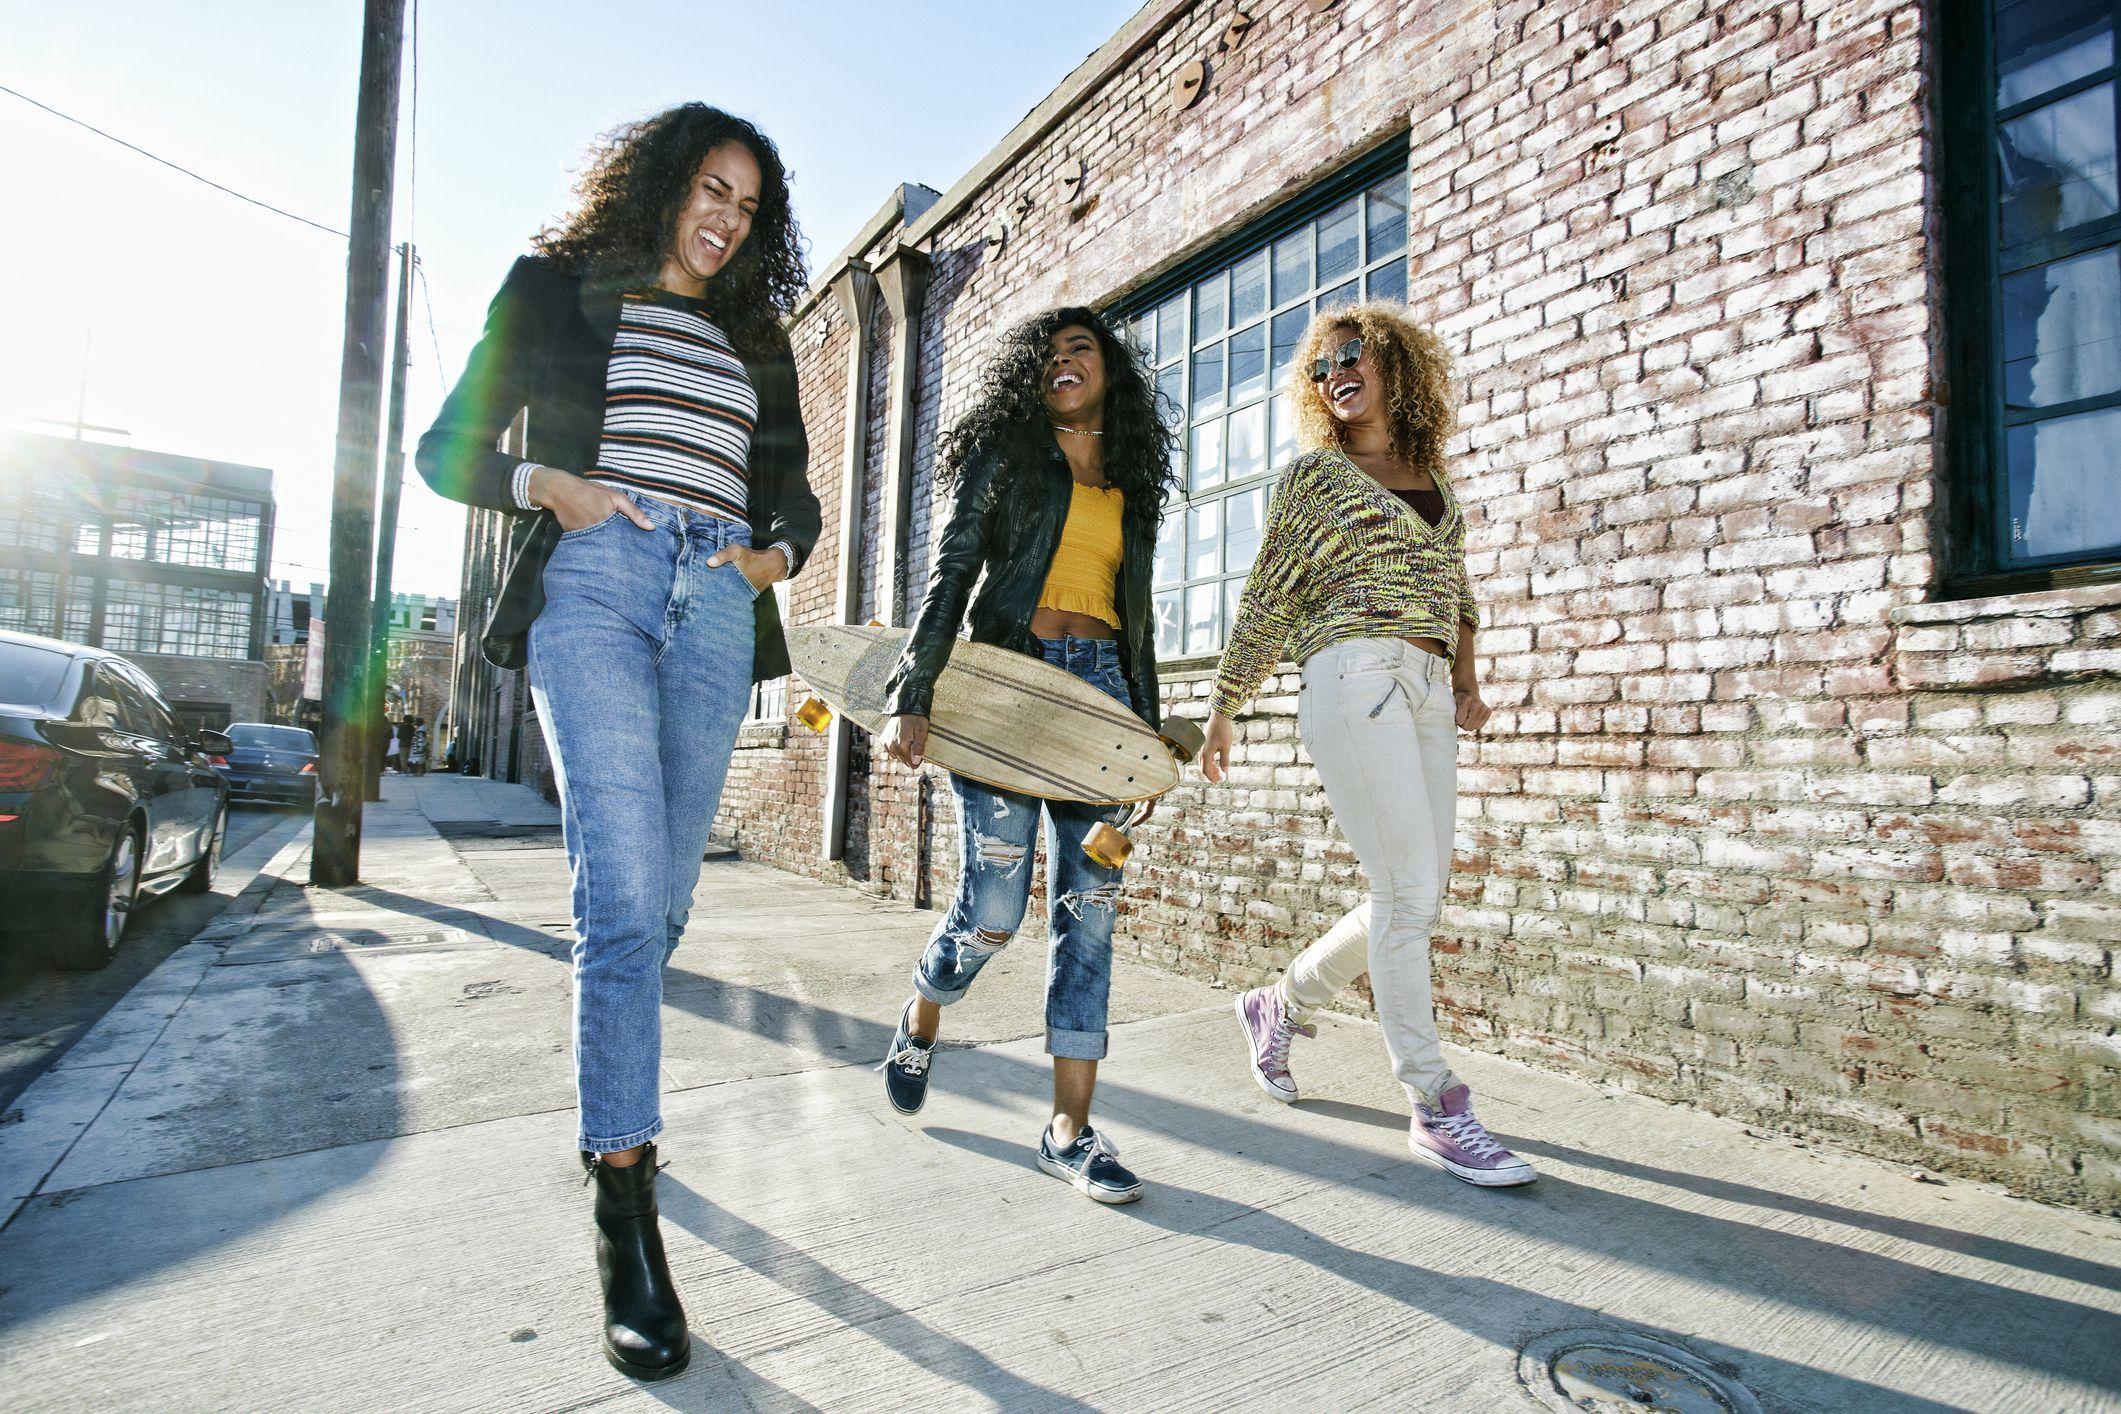 Three young women in LA walking along pavement, one carrying skateboard